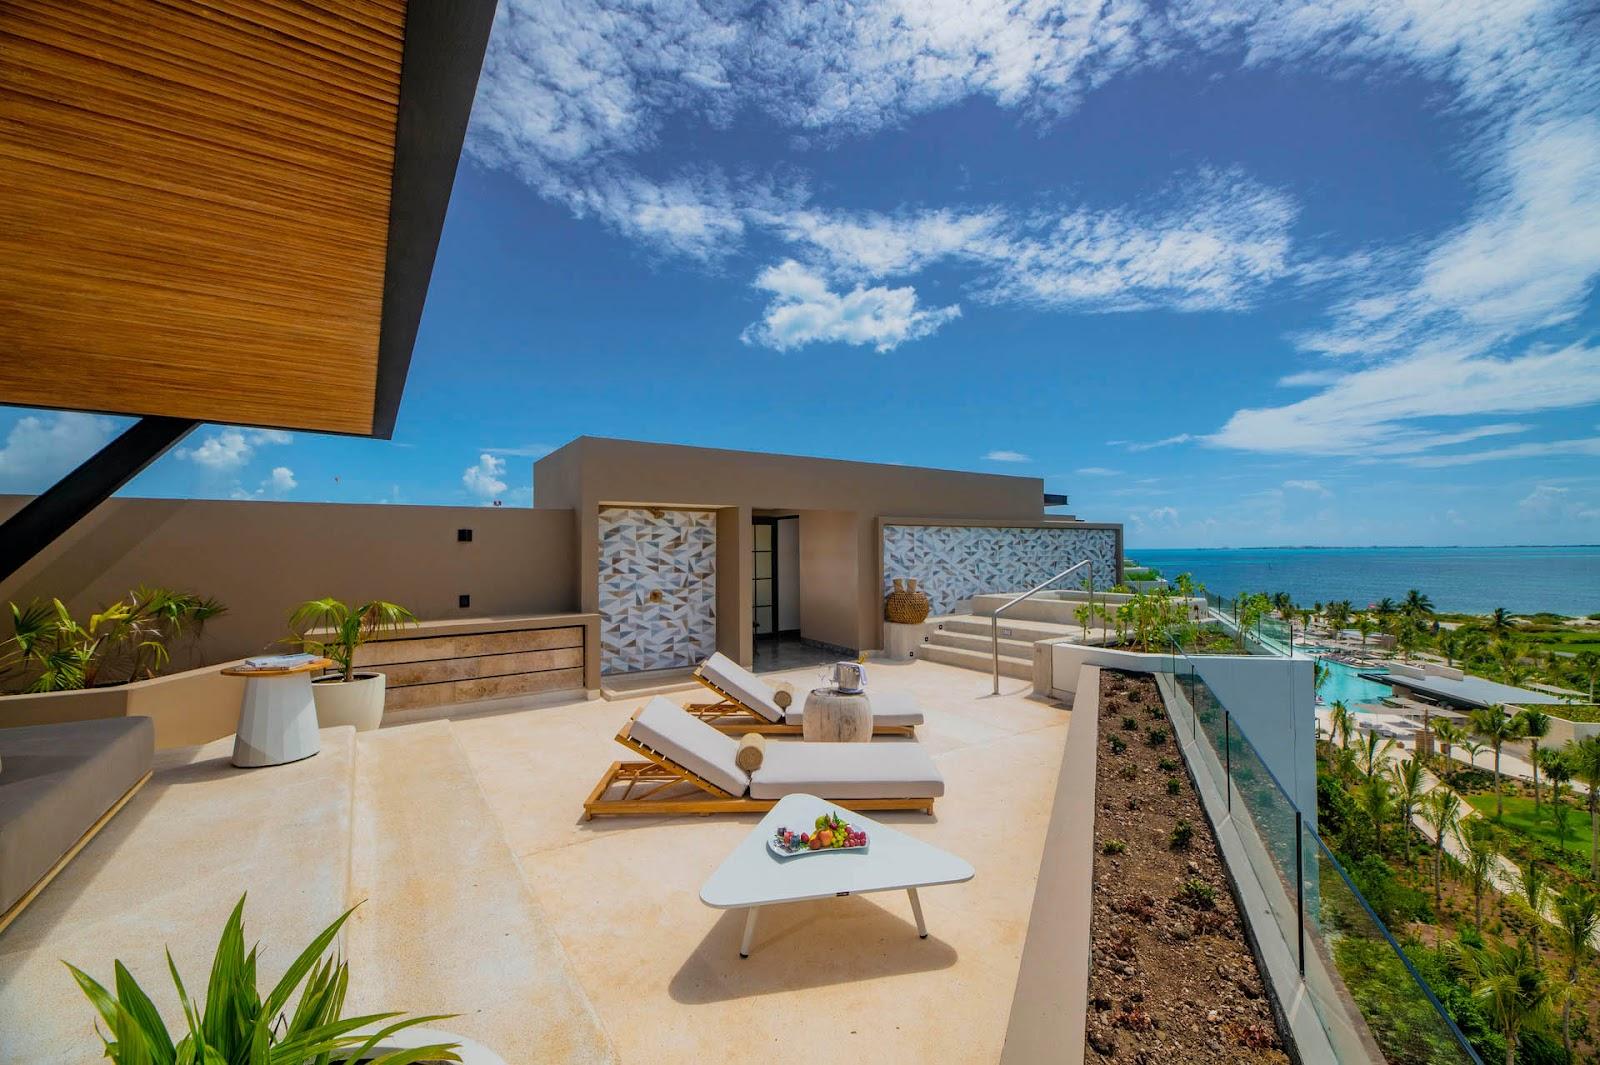 honeymoon destination in Mexico